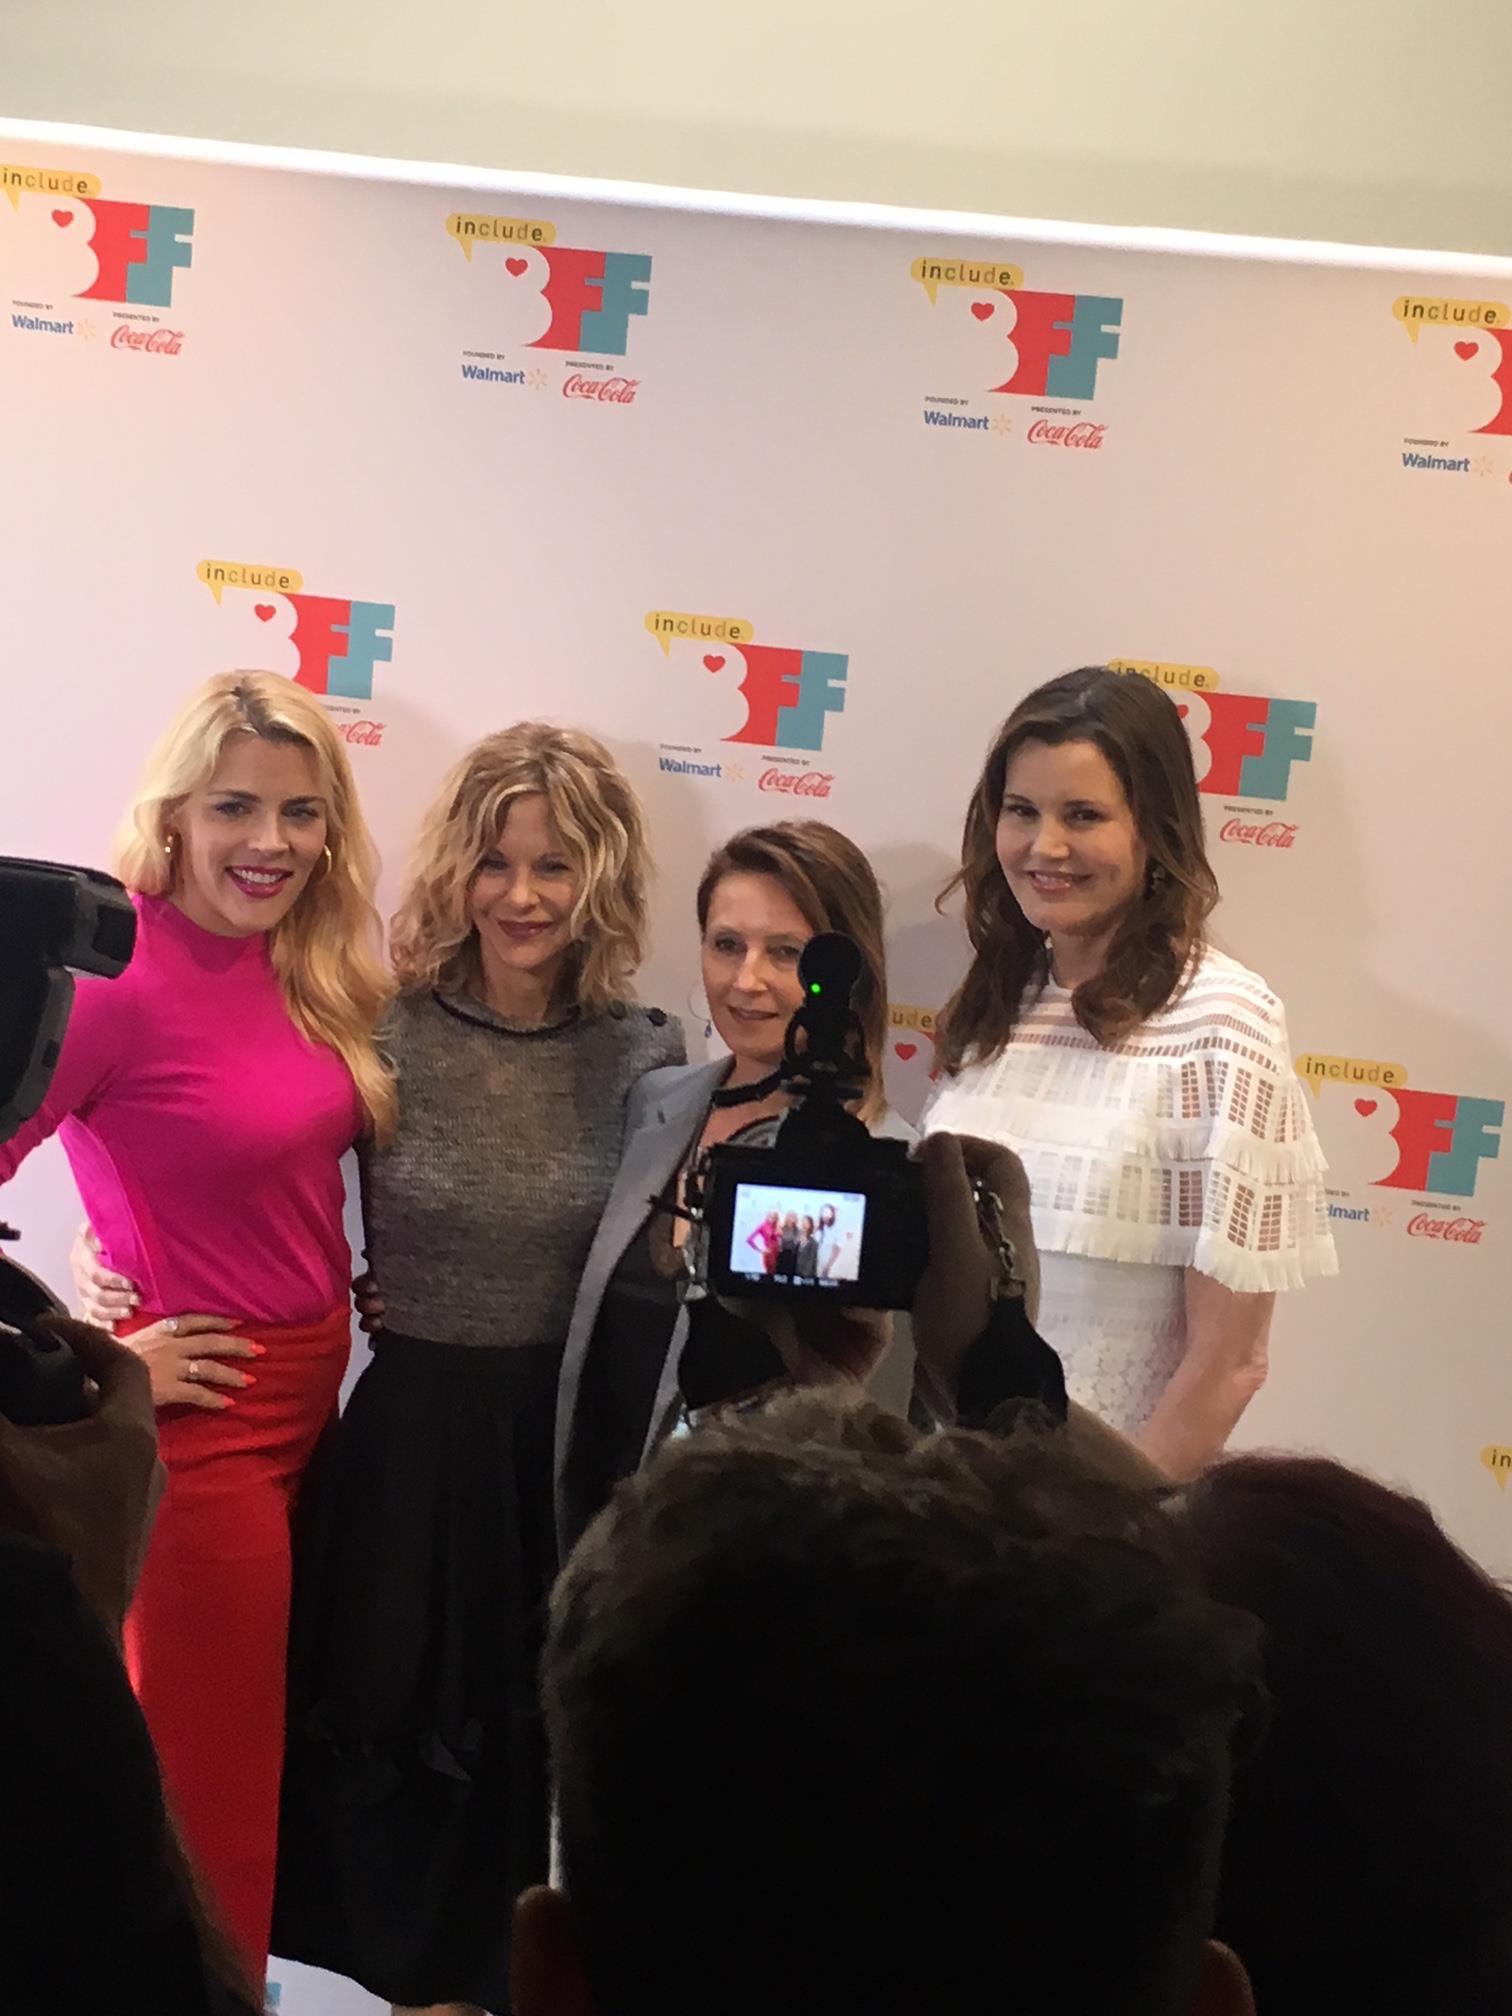 BFF 2018 - Busy Philipps, Meg Ryan, Wendy Guererro, Geena Davis  5.4.18 (Photo by Wildman).JPG